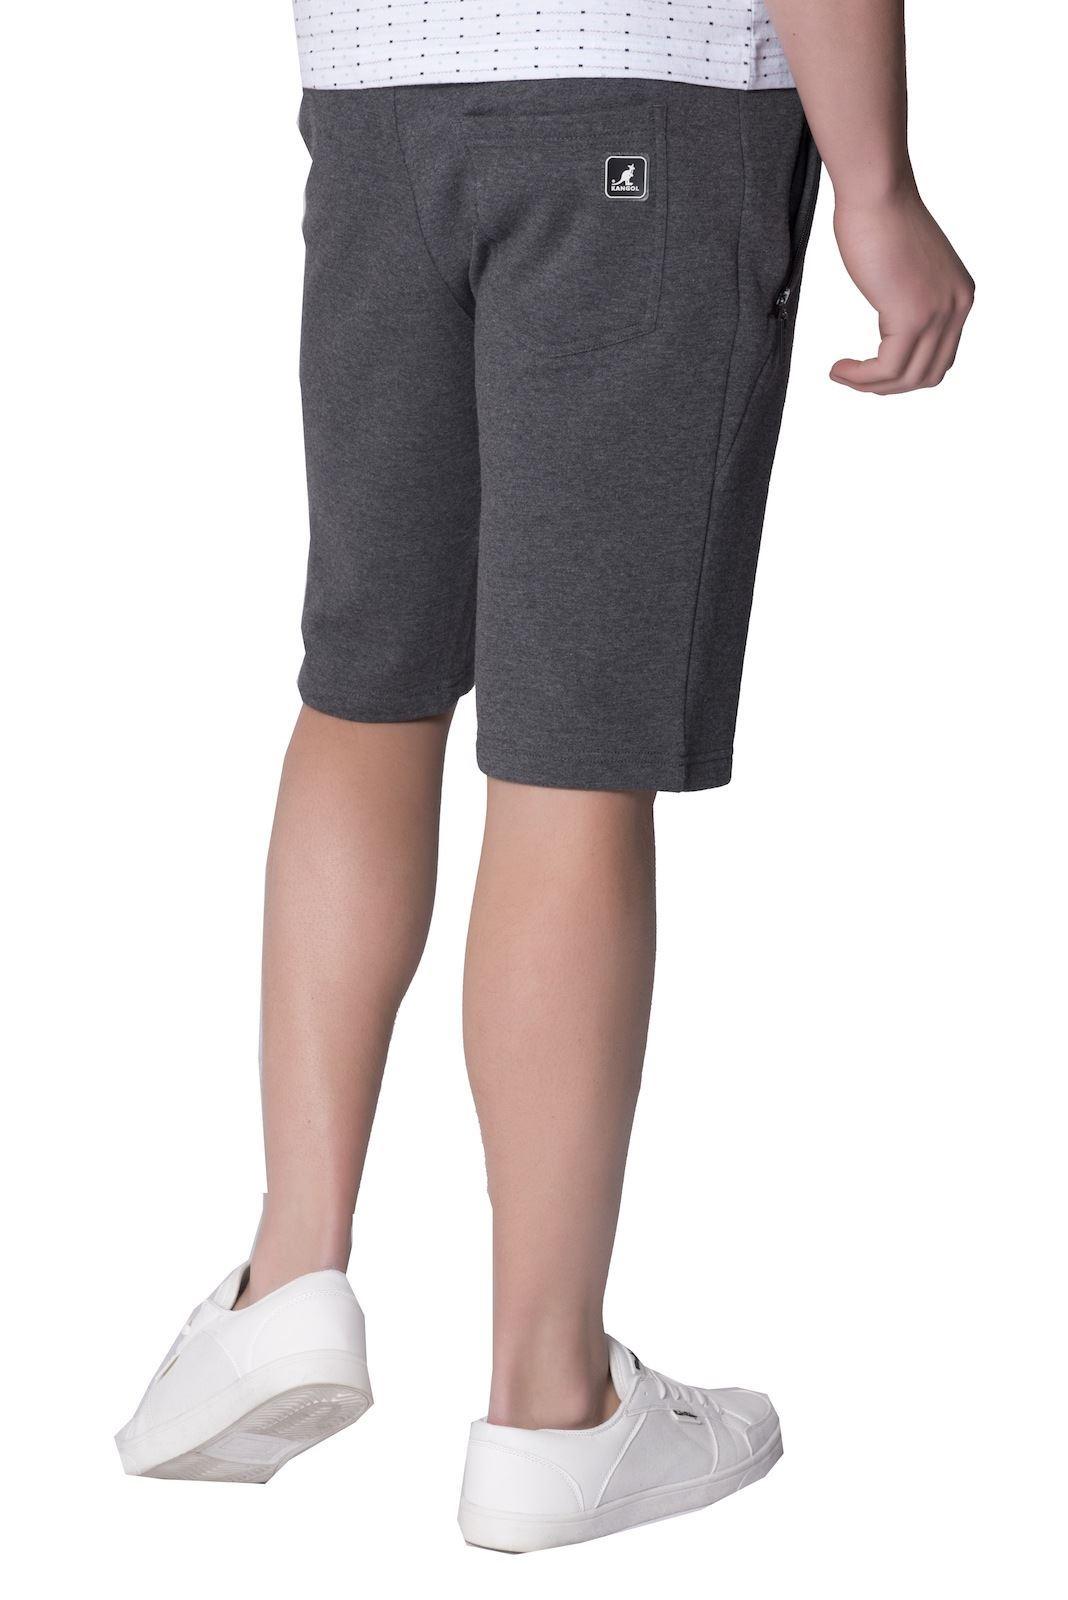 KANGOL-Designer-pelter-NEUF-pour-hommes-elastique-fermeture-eclair-poches-jogger